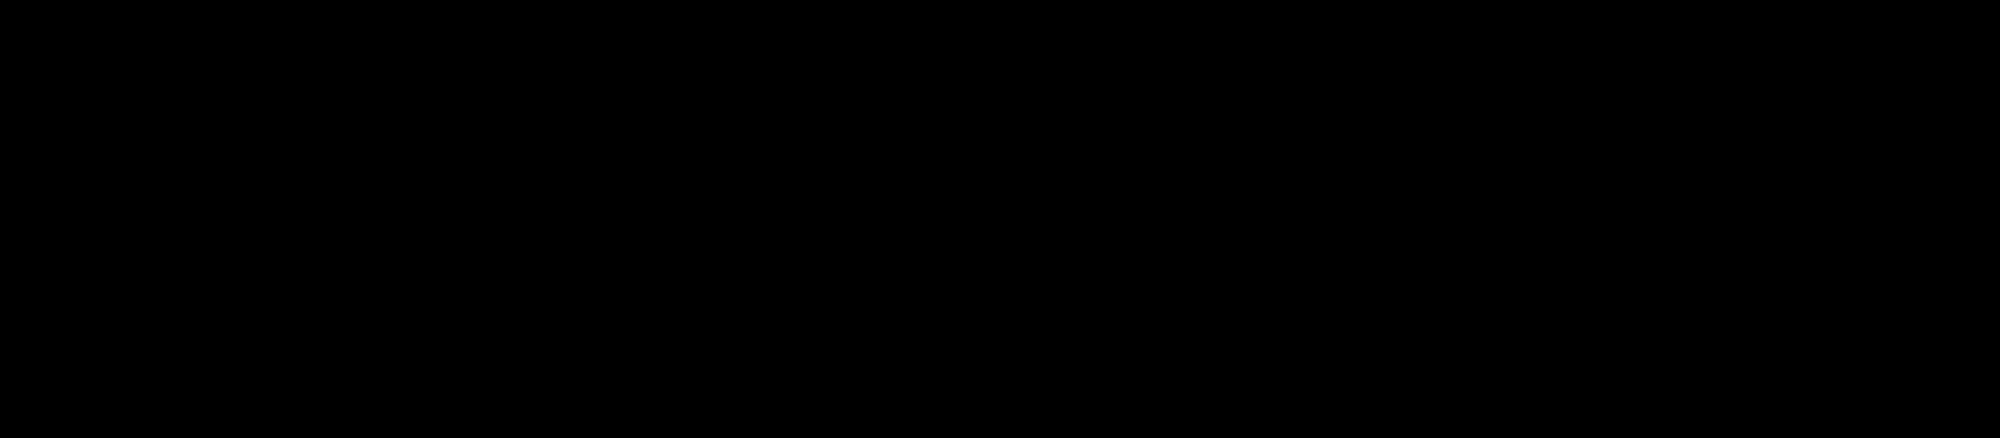 Silhouette clip art navy. Submarine clipart vector